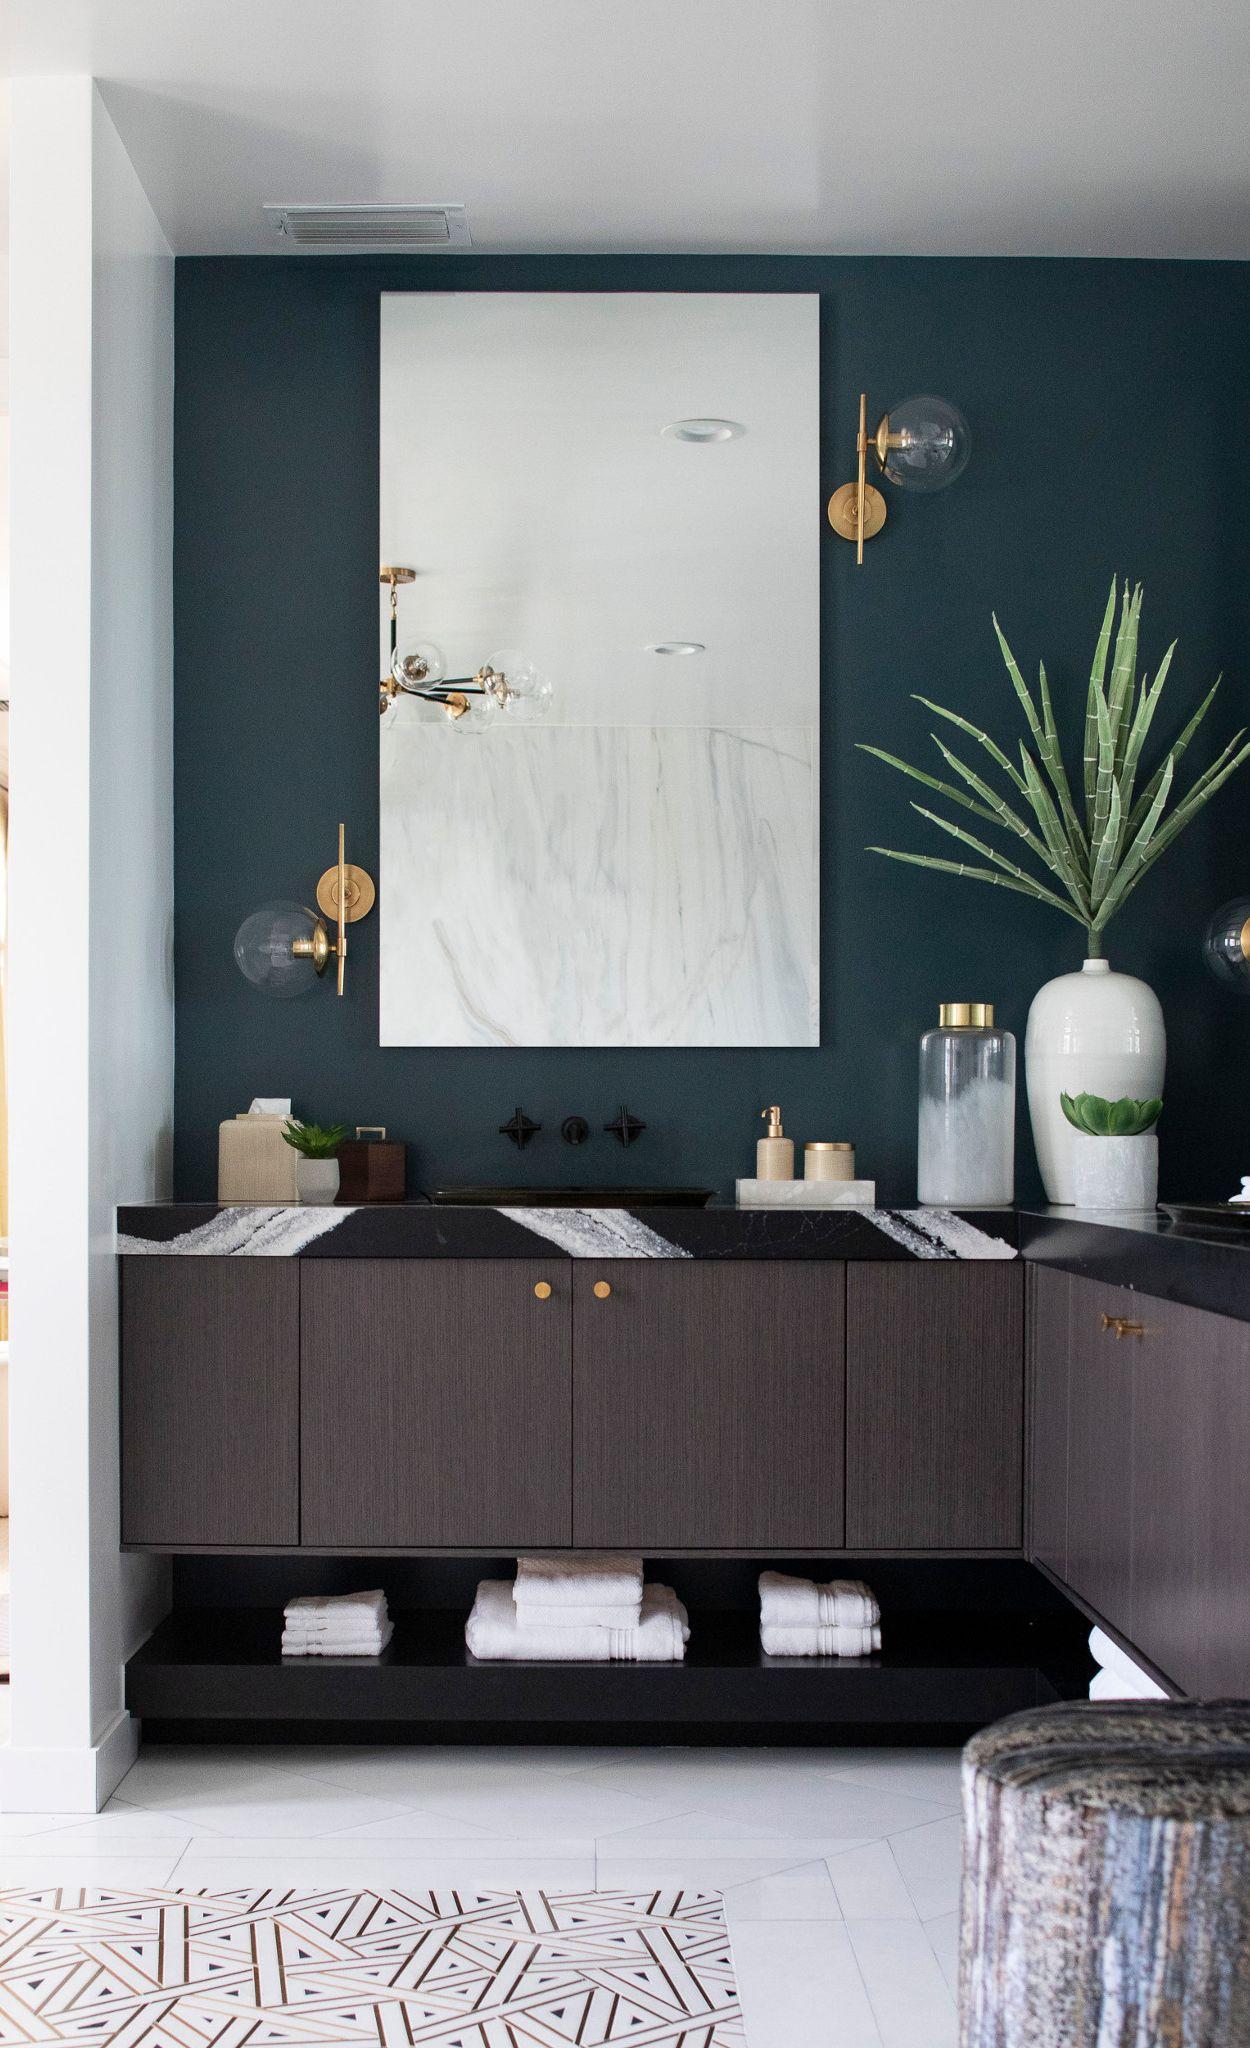 Stunning black quartz countertops in Cambria Mersey™ create a glam master bathroom.